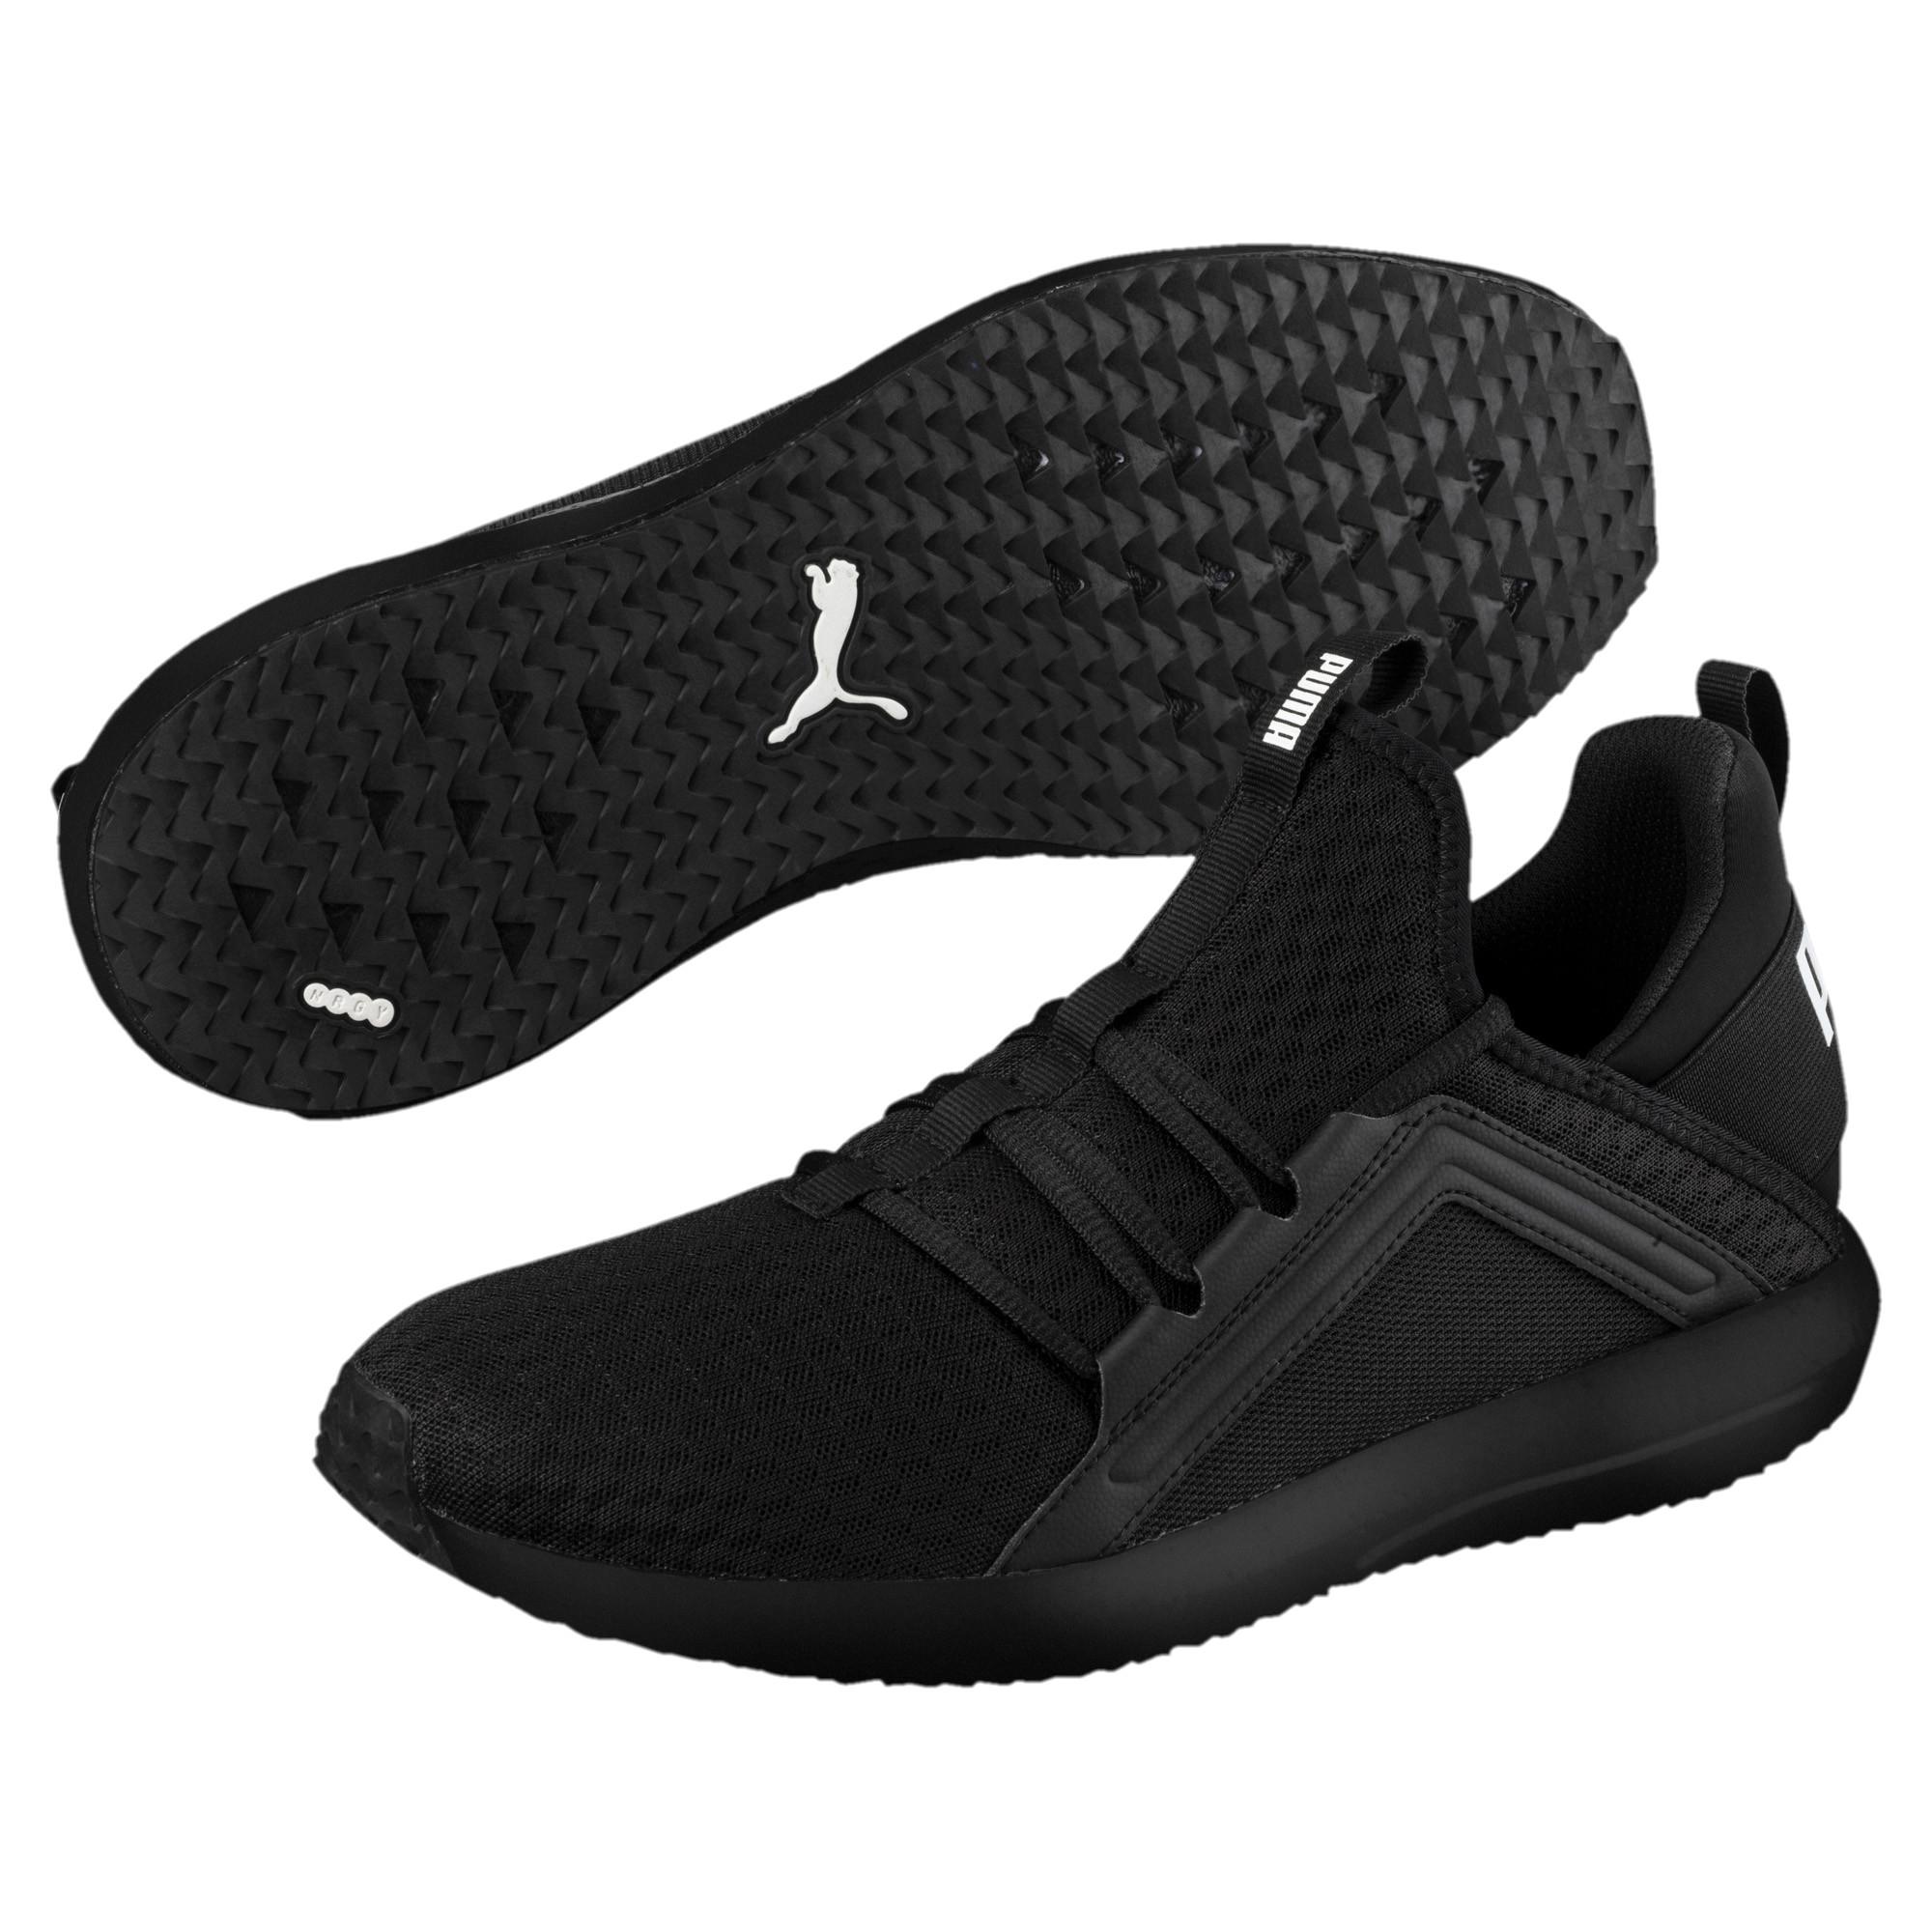 Puma Mega NRGY Men's Running shoes $40, (was $100) @ Puma AU